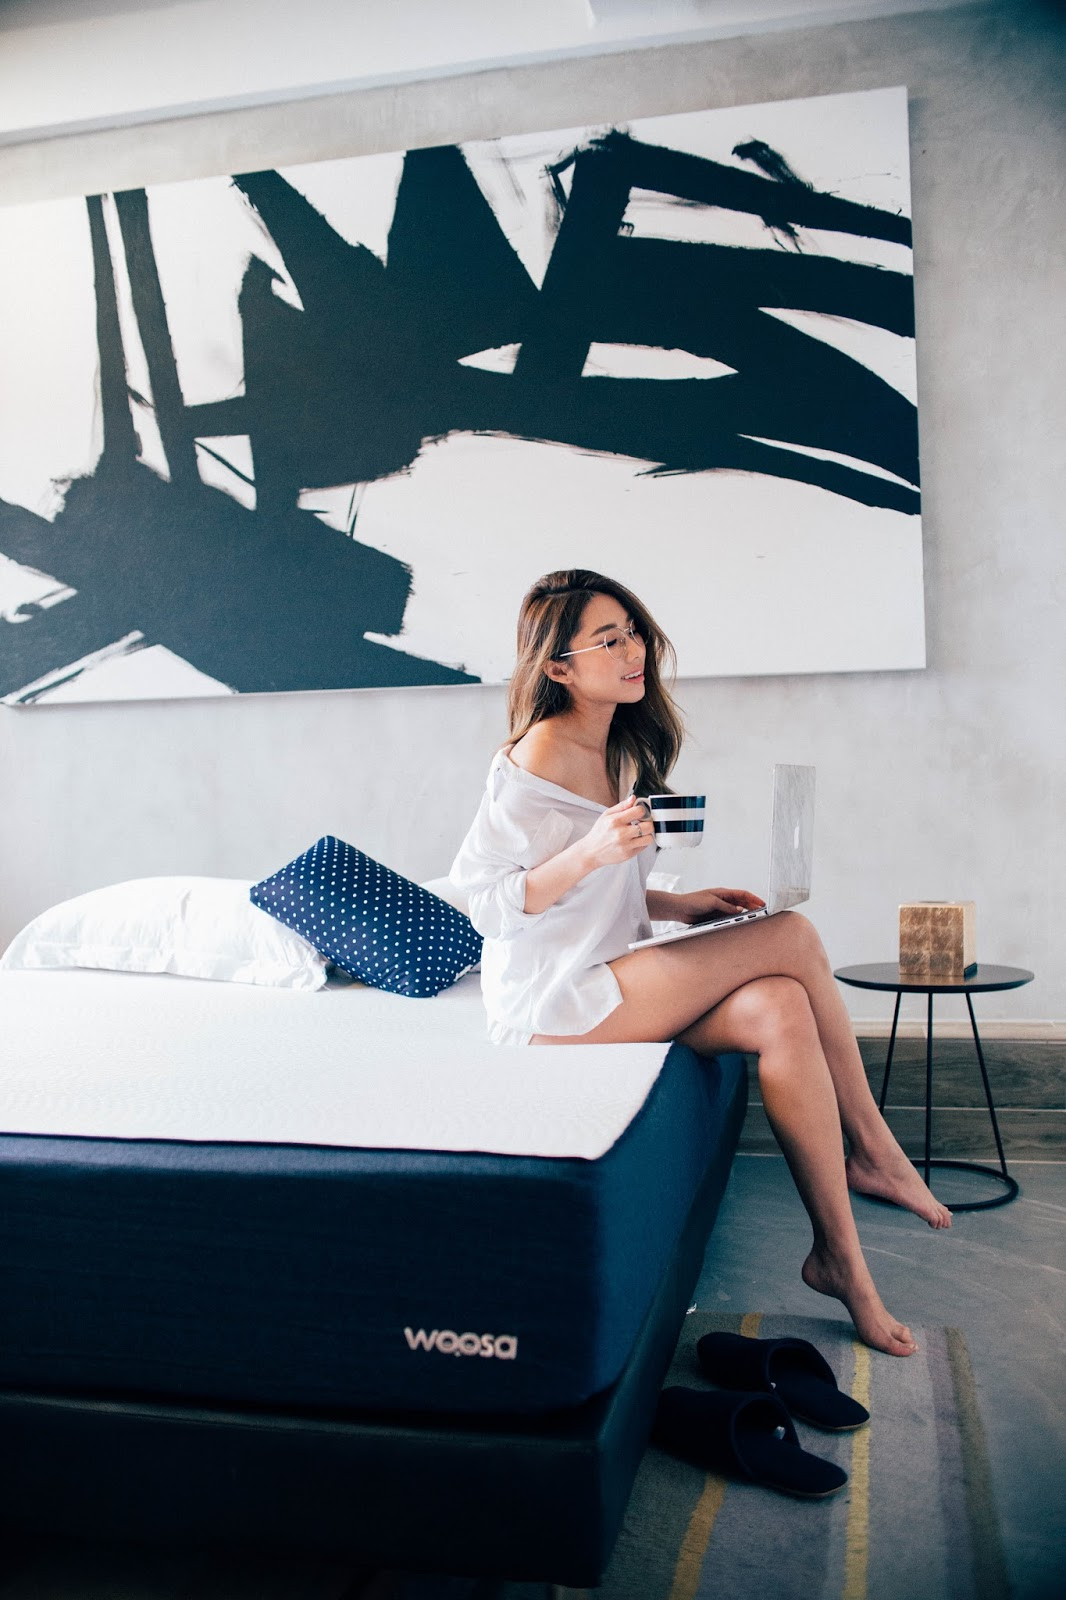 woosa mattress, memory foam, singapore, affordable mattress